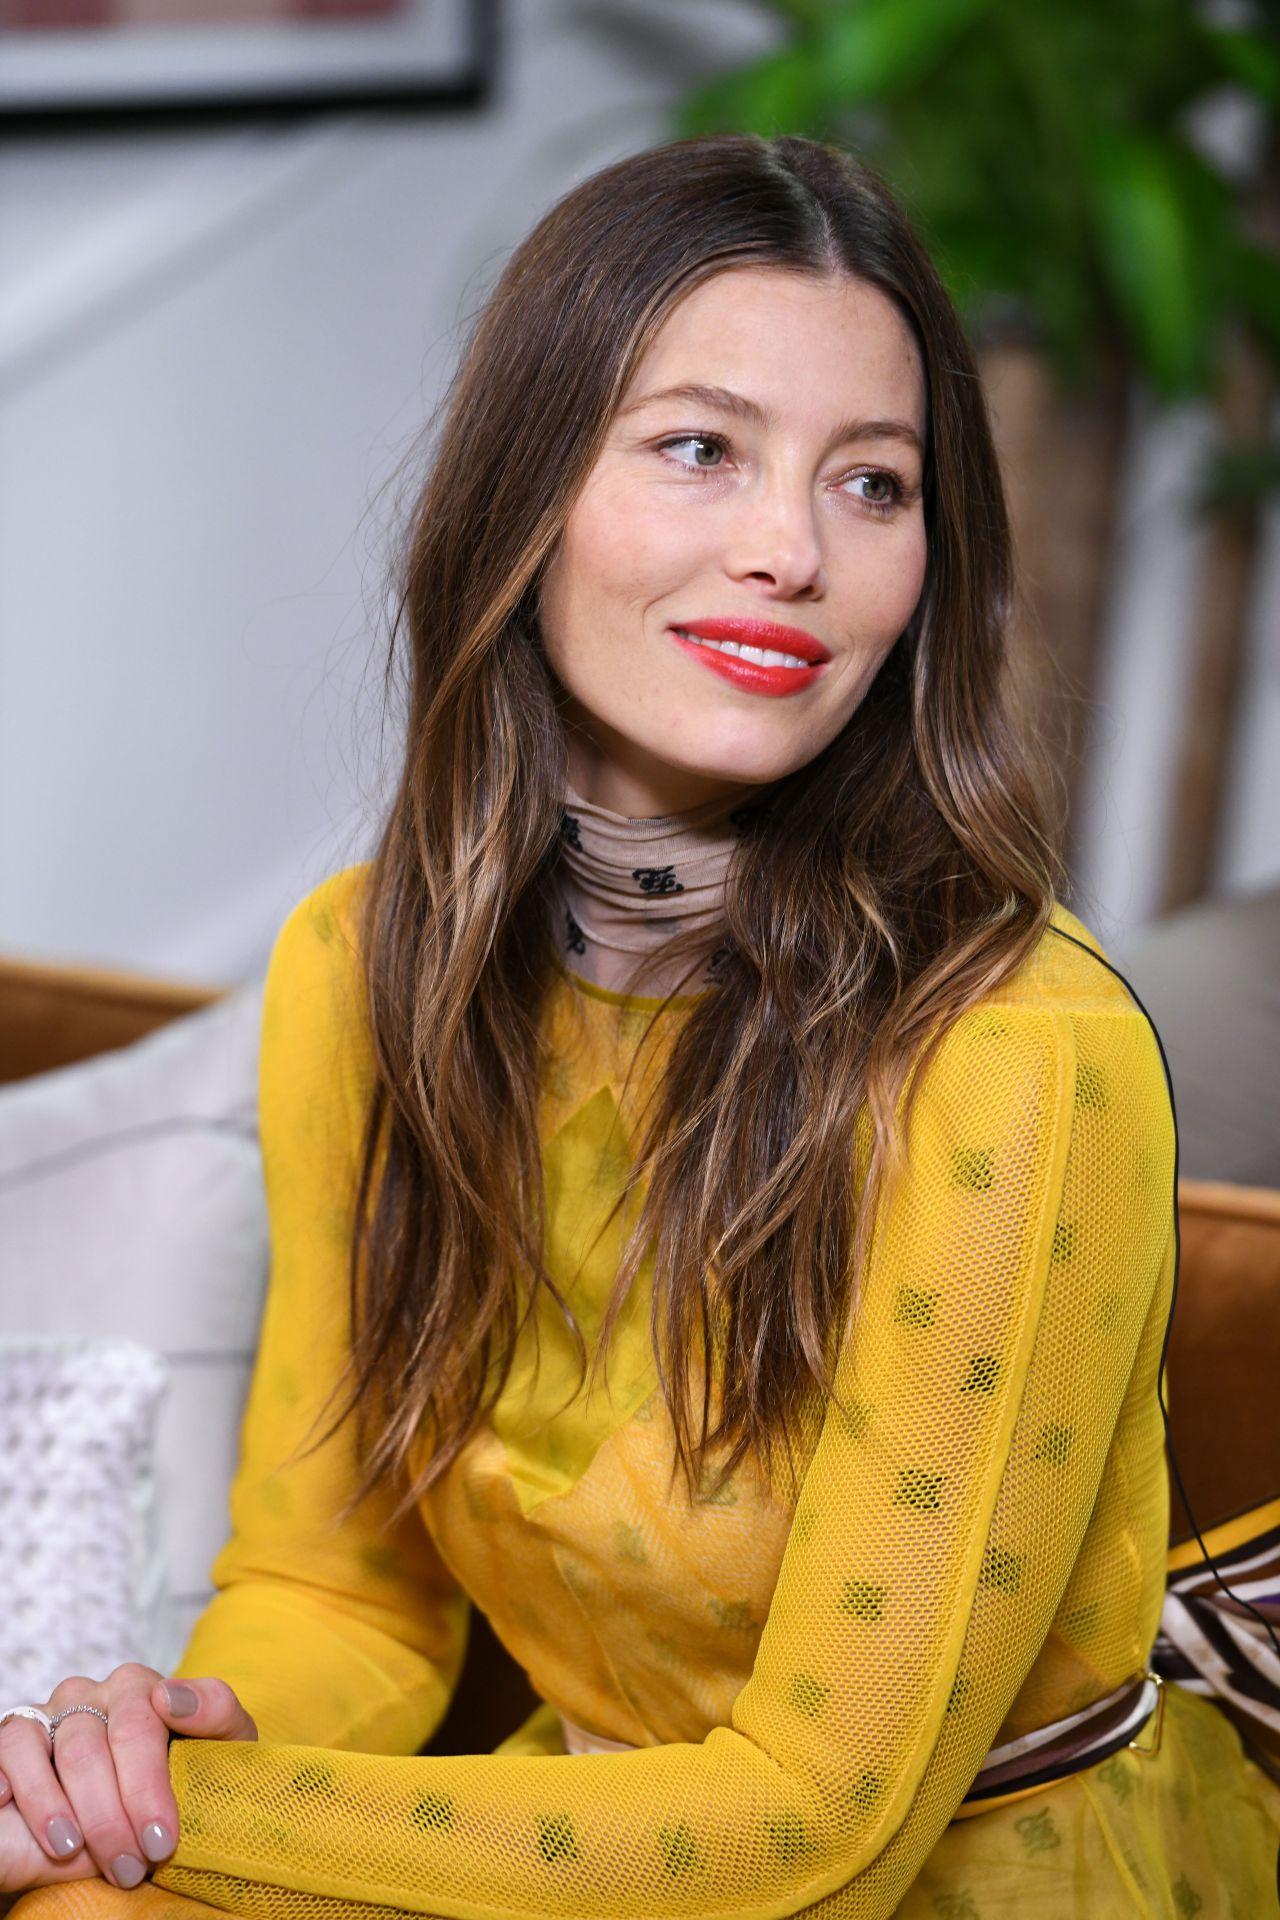 Jessica Biel gorgeous in yellow dress, She is so pretty :)